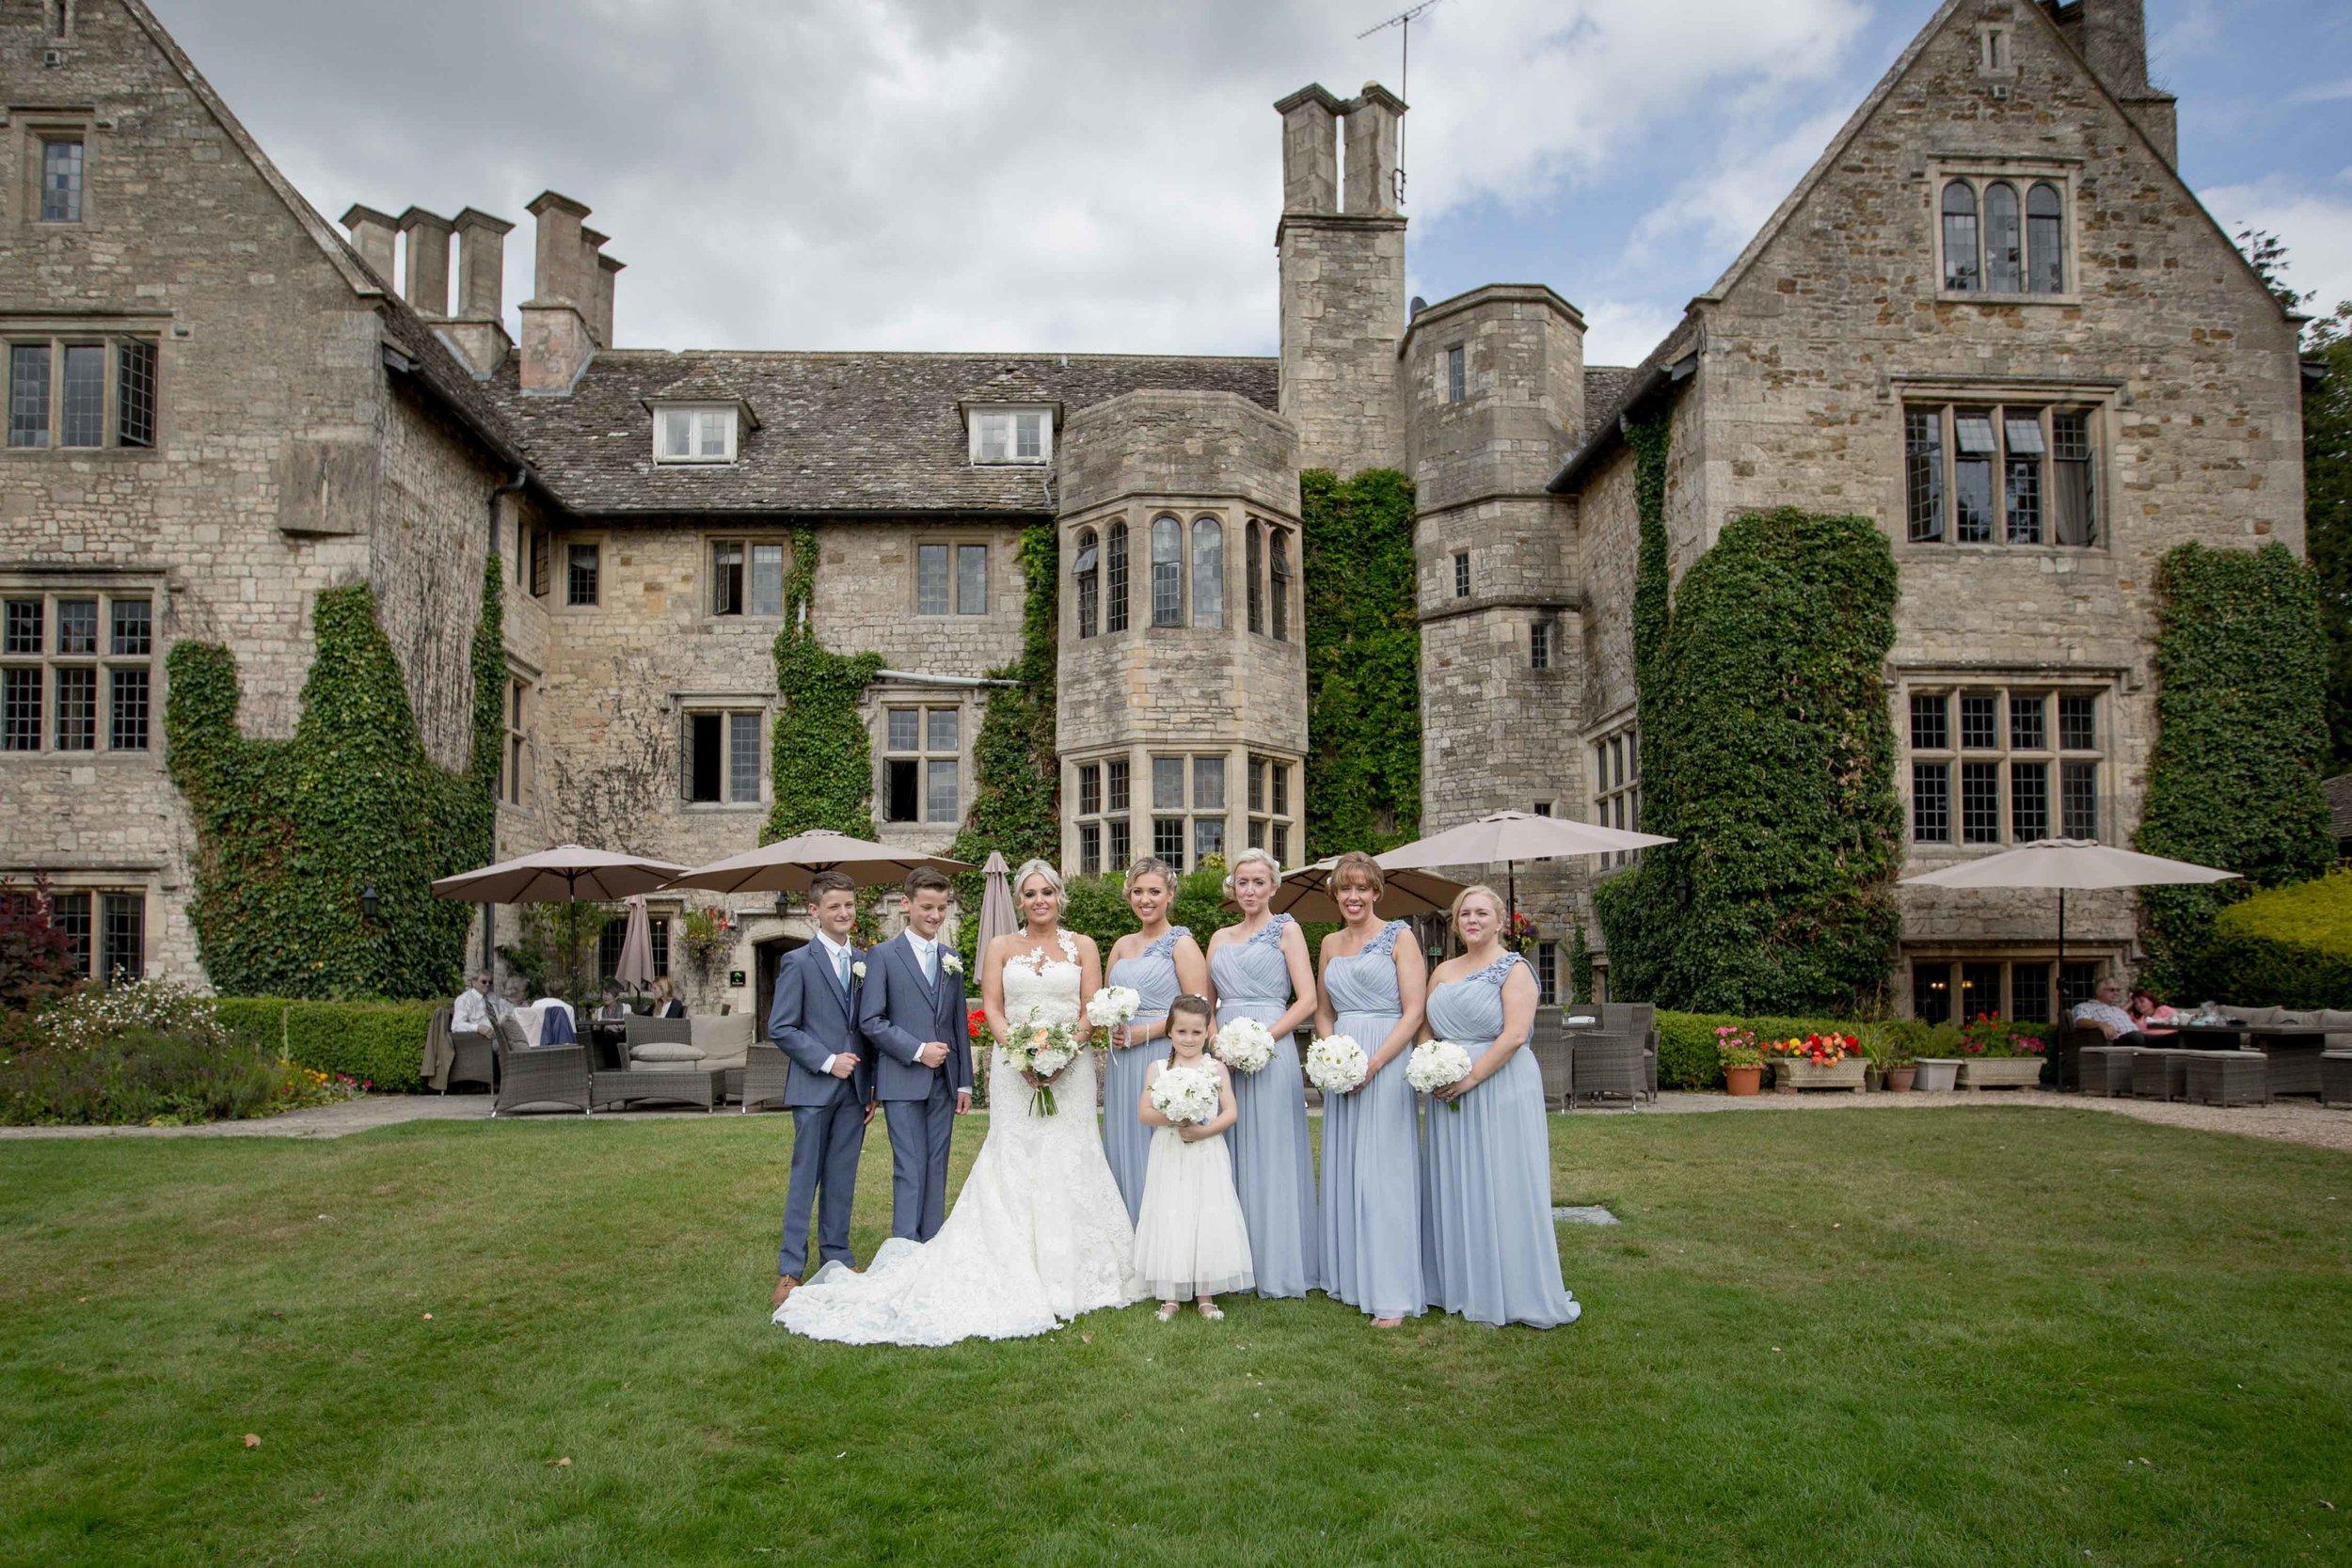 cotswold-wedding-photography-at-stonehouse-court-hotel-natalia-smith-photography-gloucestershire-wedding-photographer-30.jpg